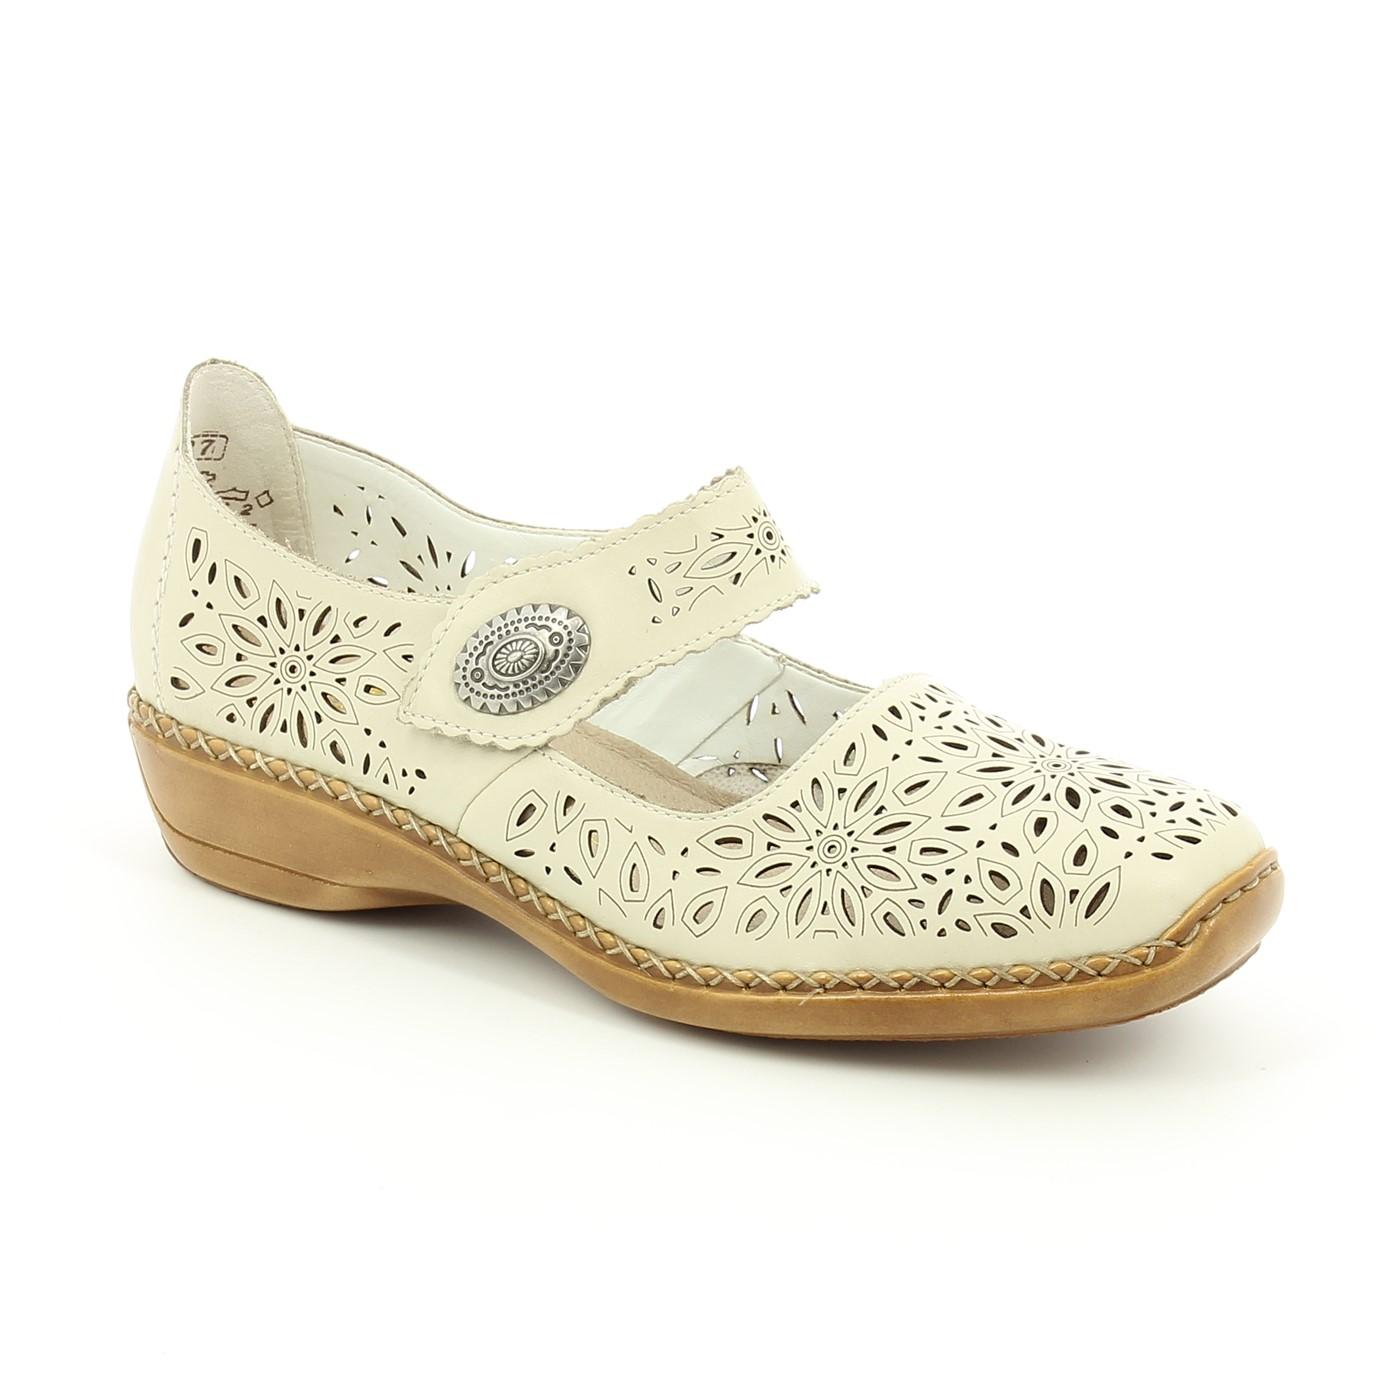 Bercolini Kényelmes cipők Rieker, női, fél, bőr